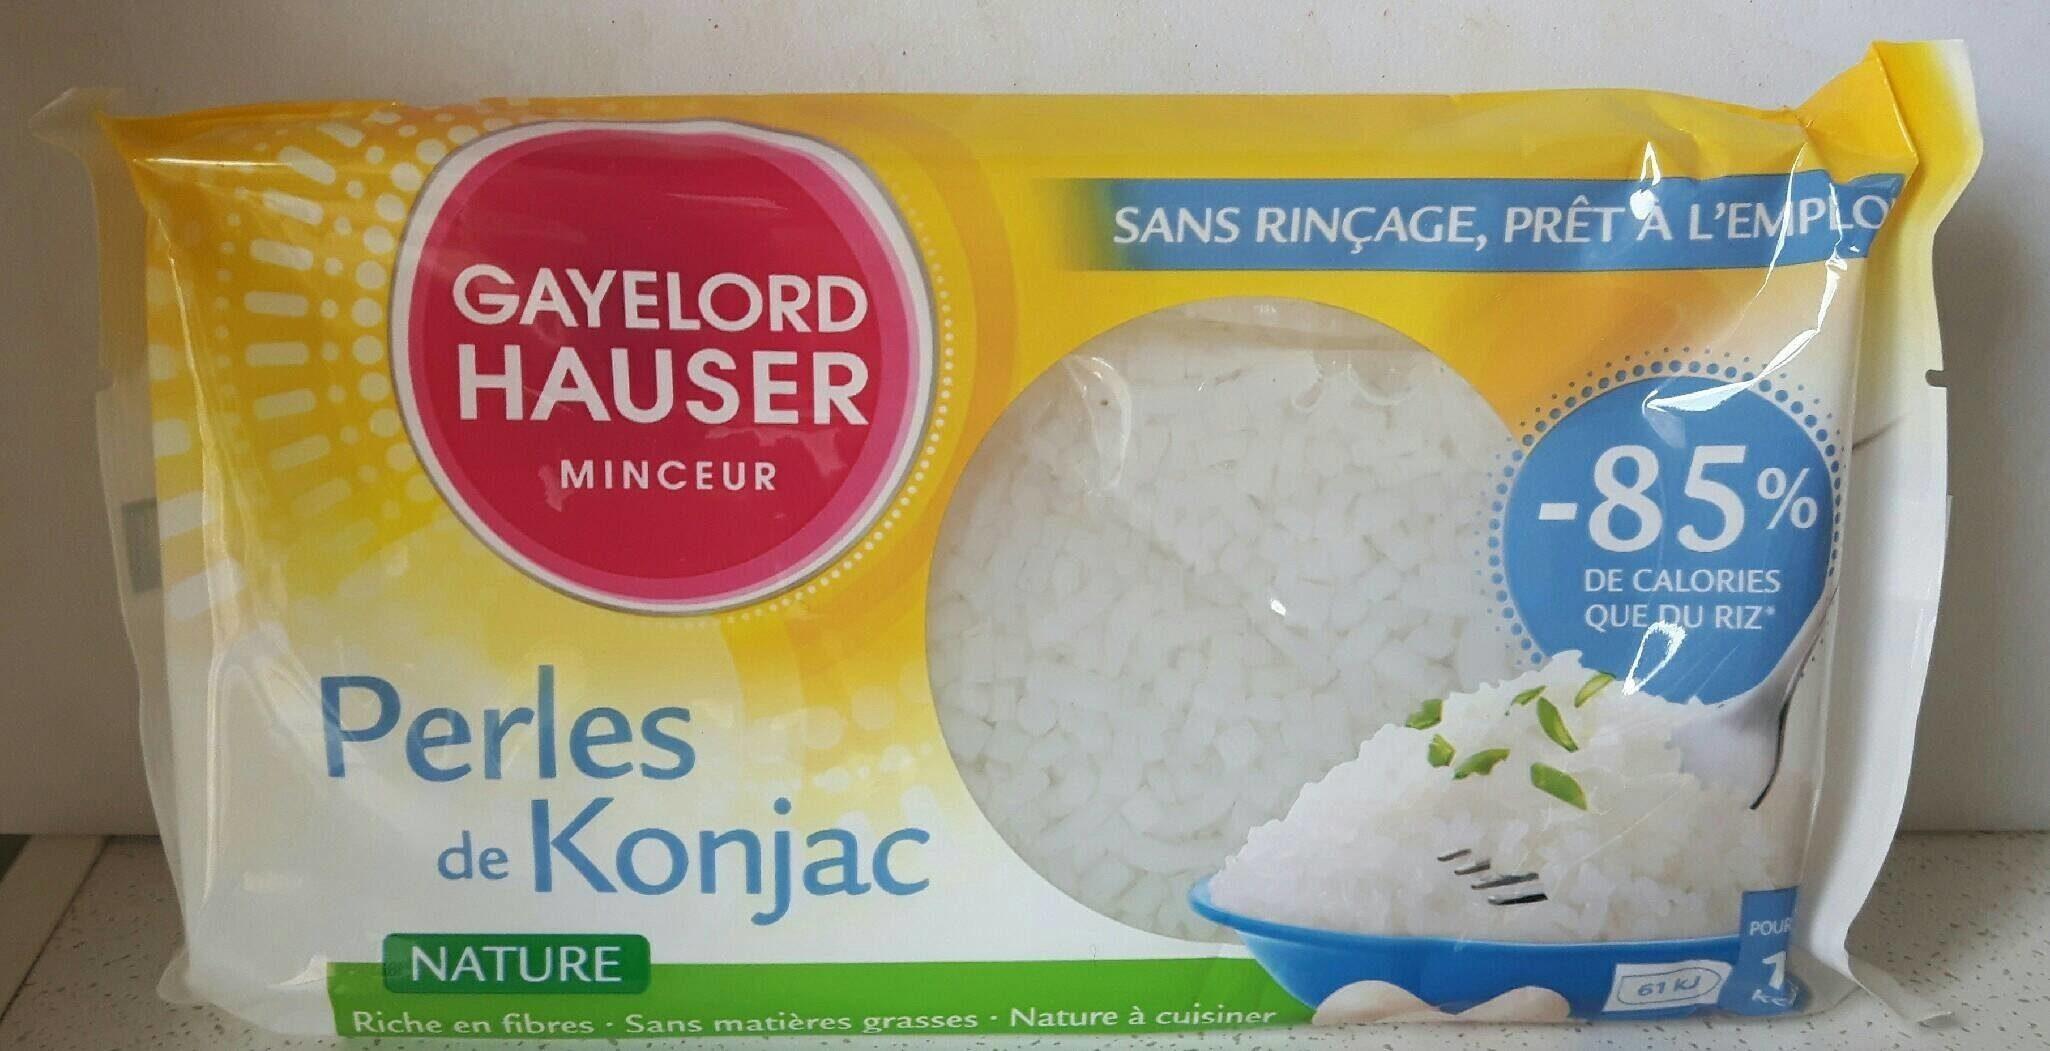 Perles de konjac - Produit - fr